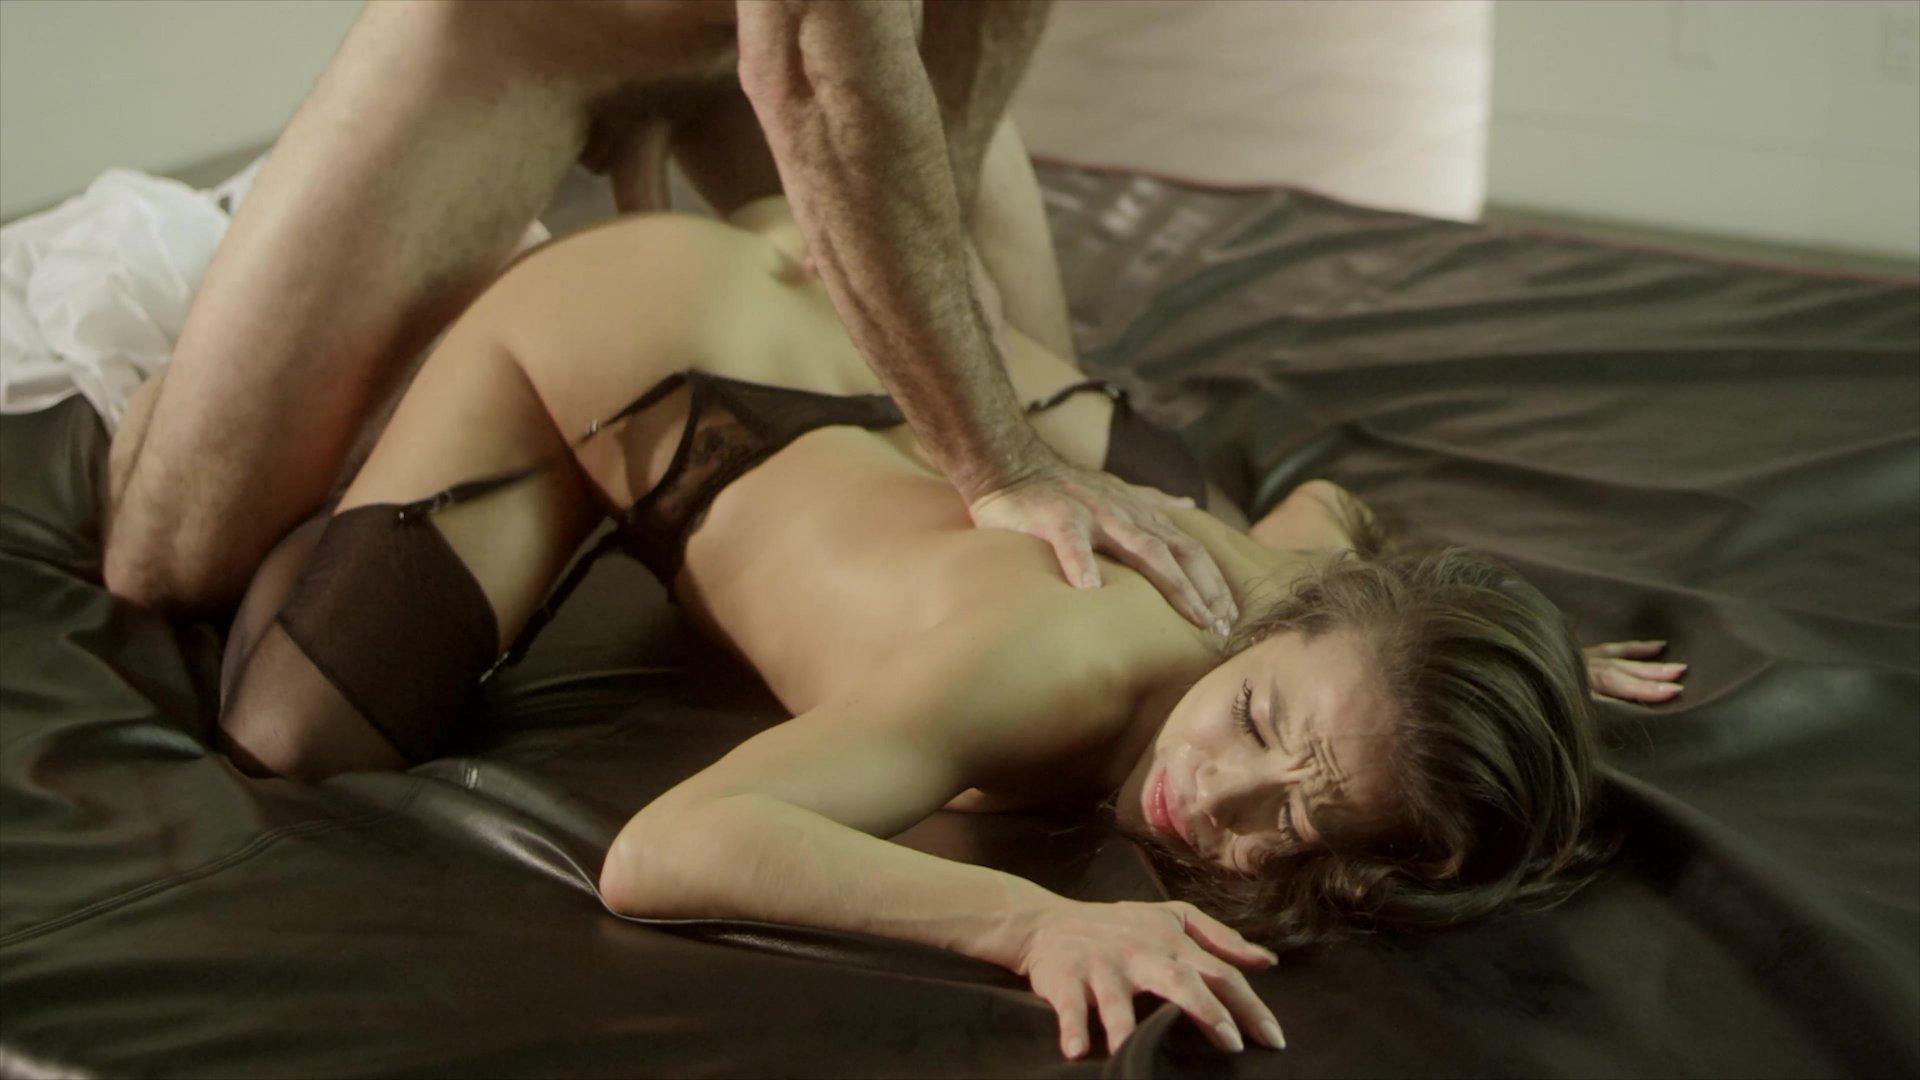 Gratis Film Erotik Escort Mogen